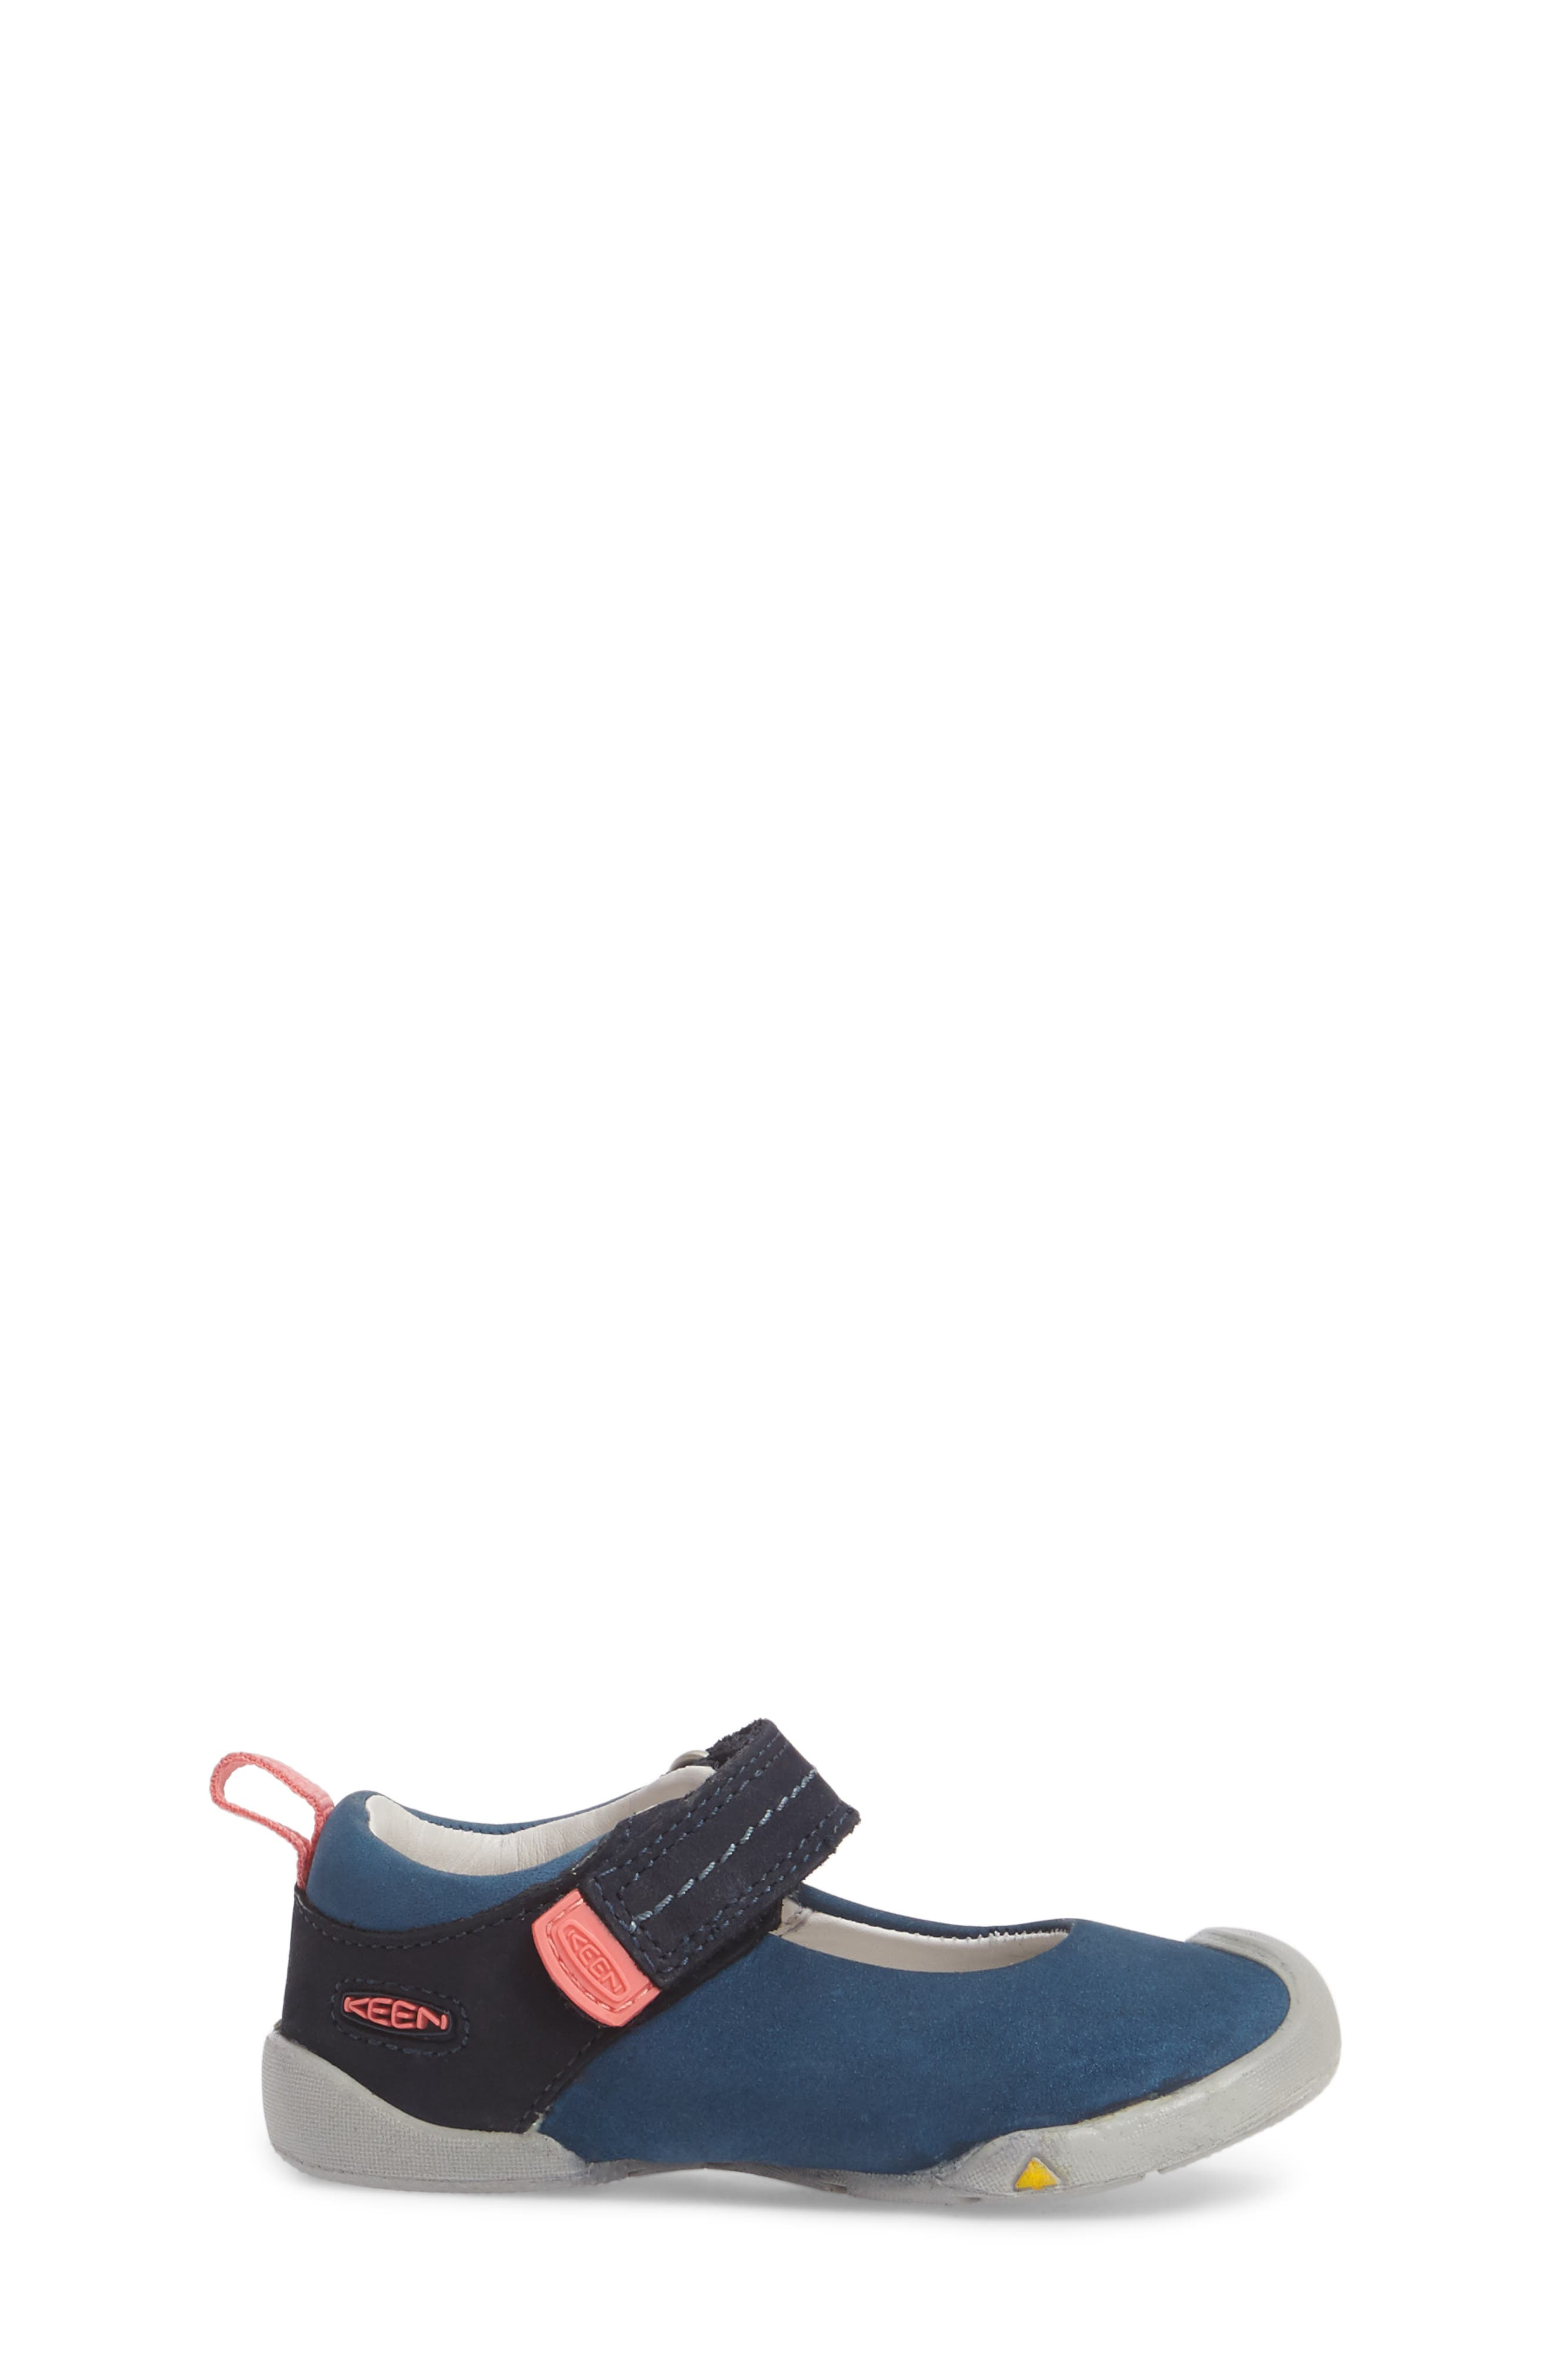 Pep Mary Jane-T Sneaker,                             Alternate thumbnail 5, color,